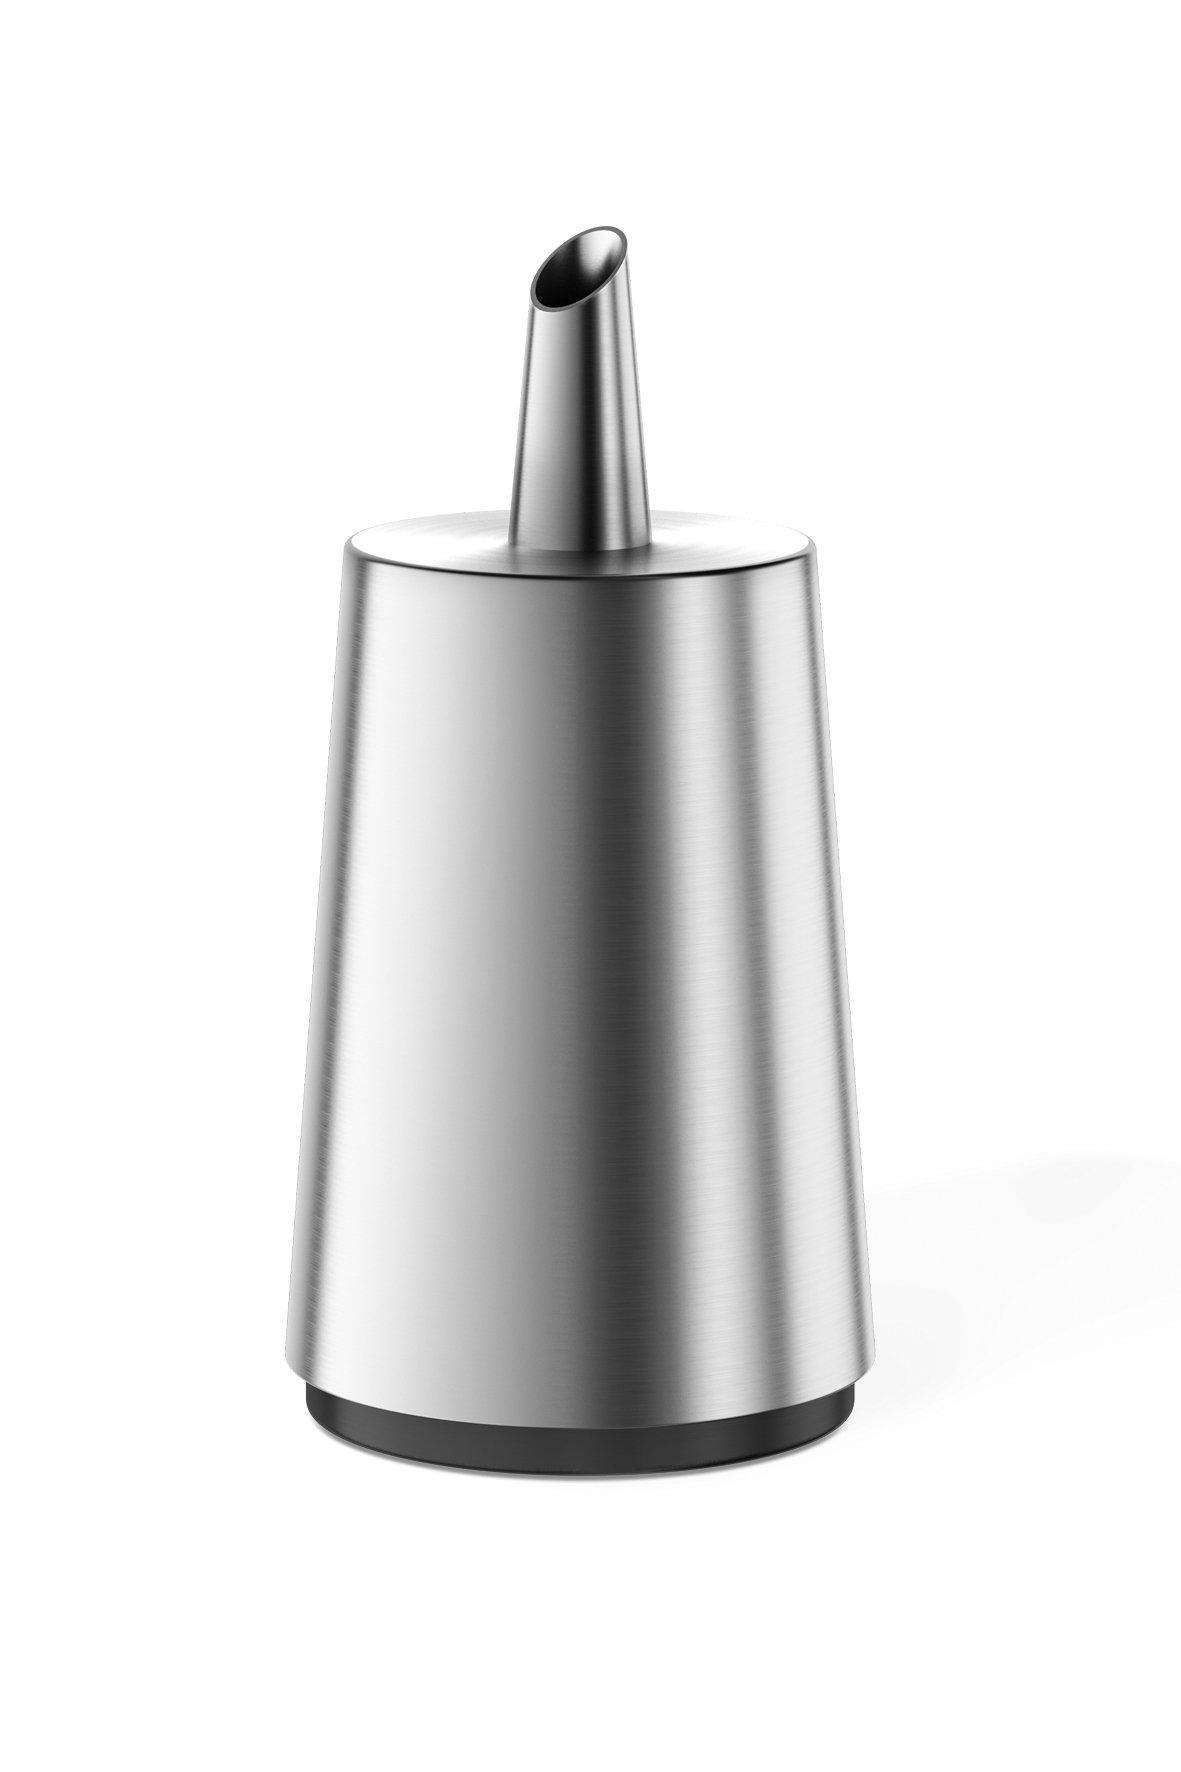 ZACK 20633 Toco Sugar Dispenser, 5.51 by 2.76-Inch by Zack